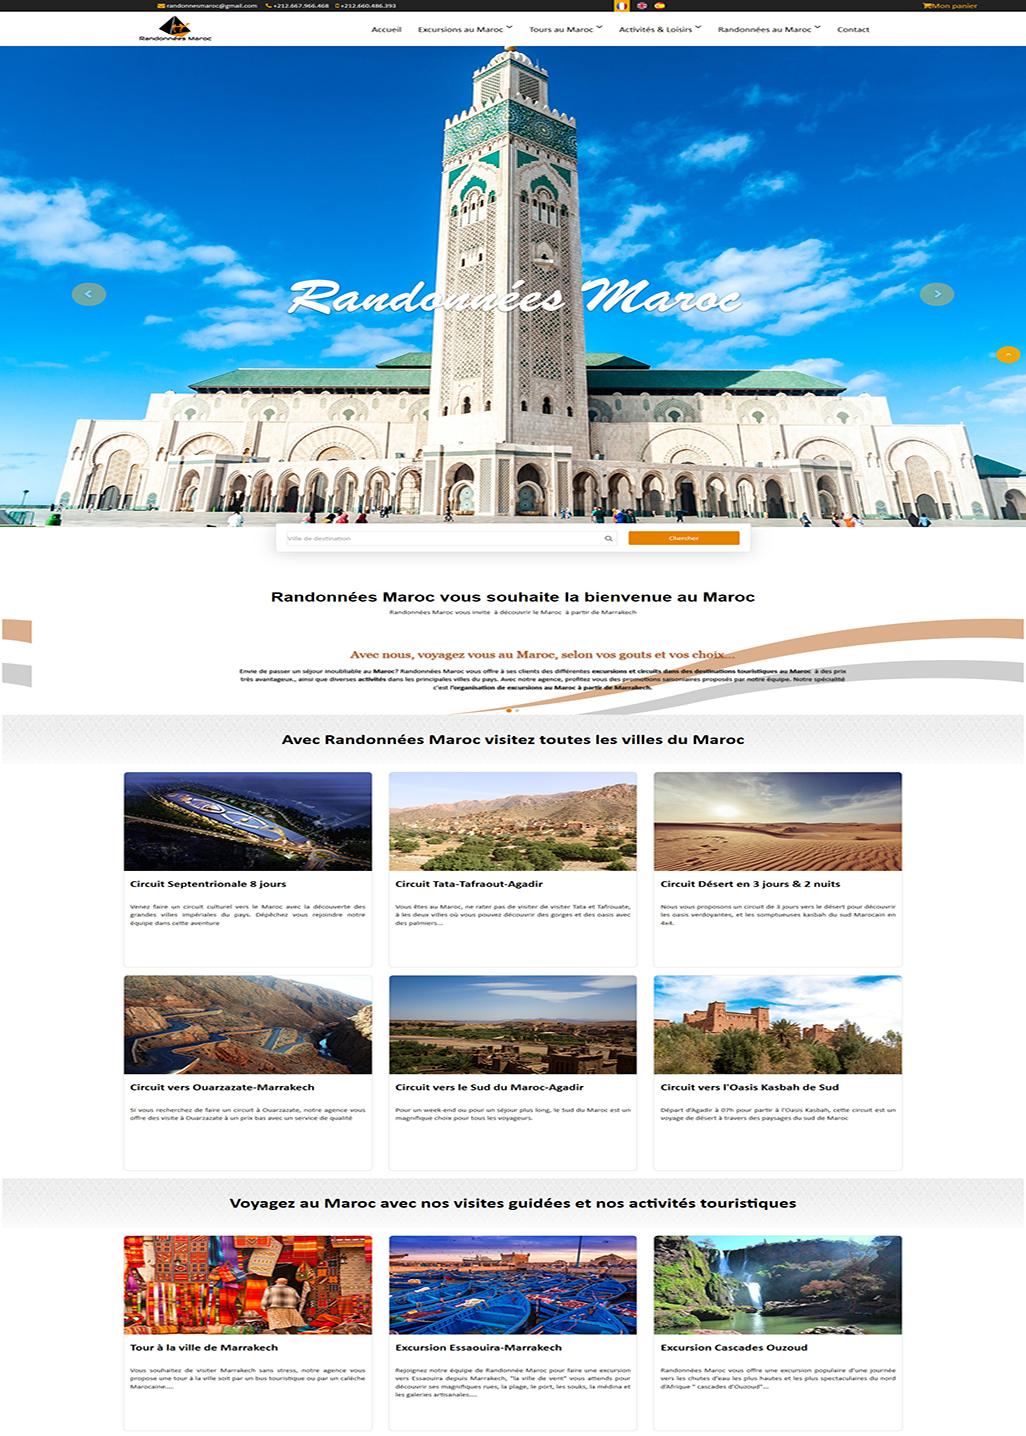 Randonnées Maroc